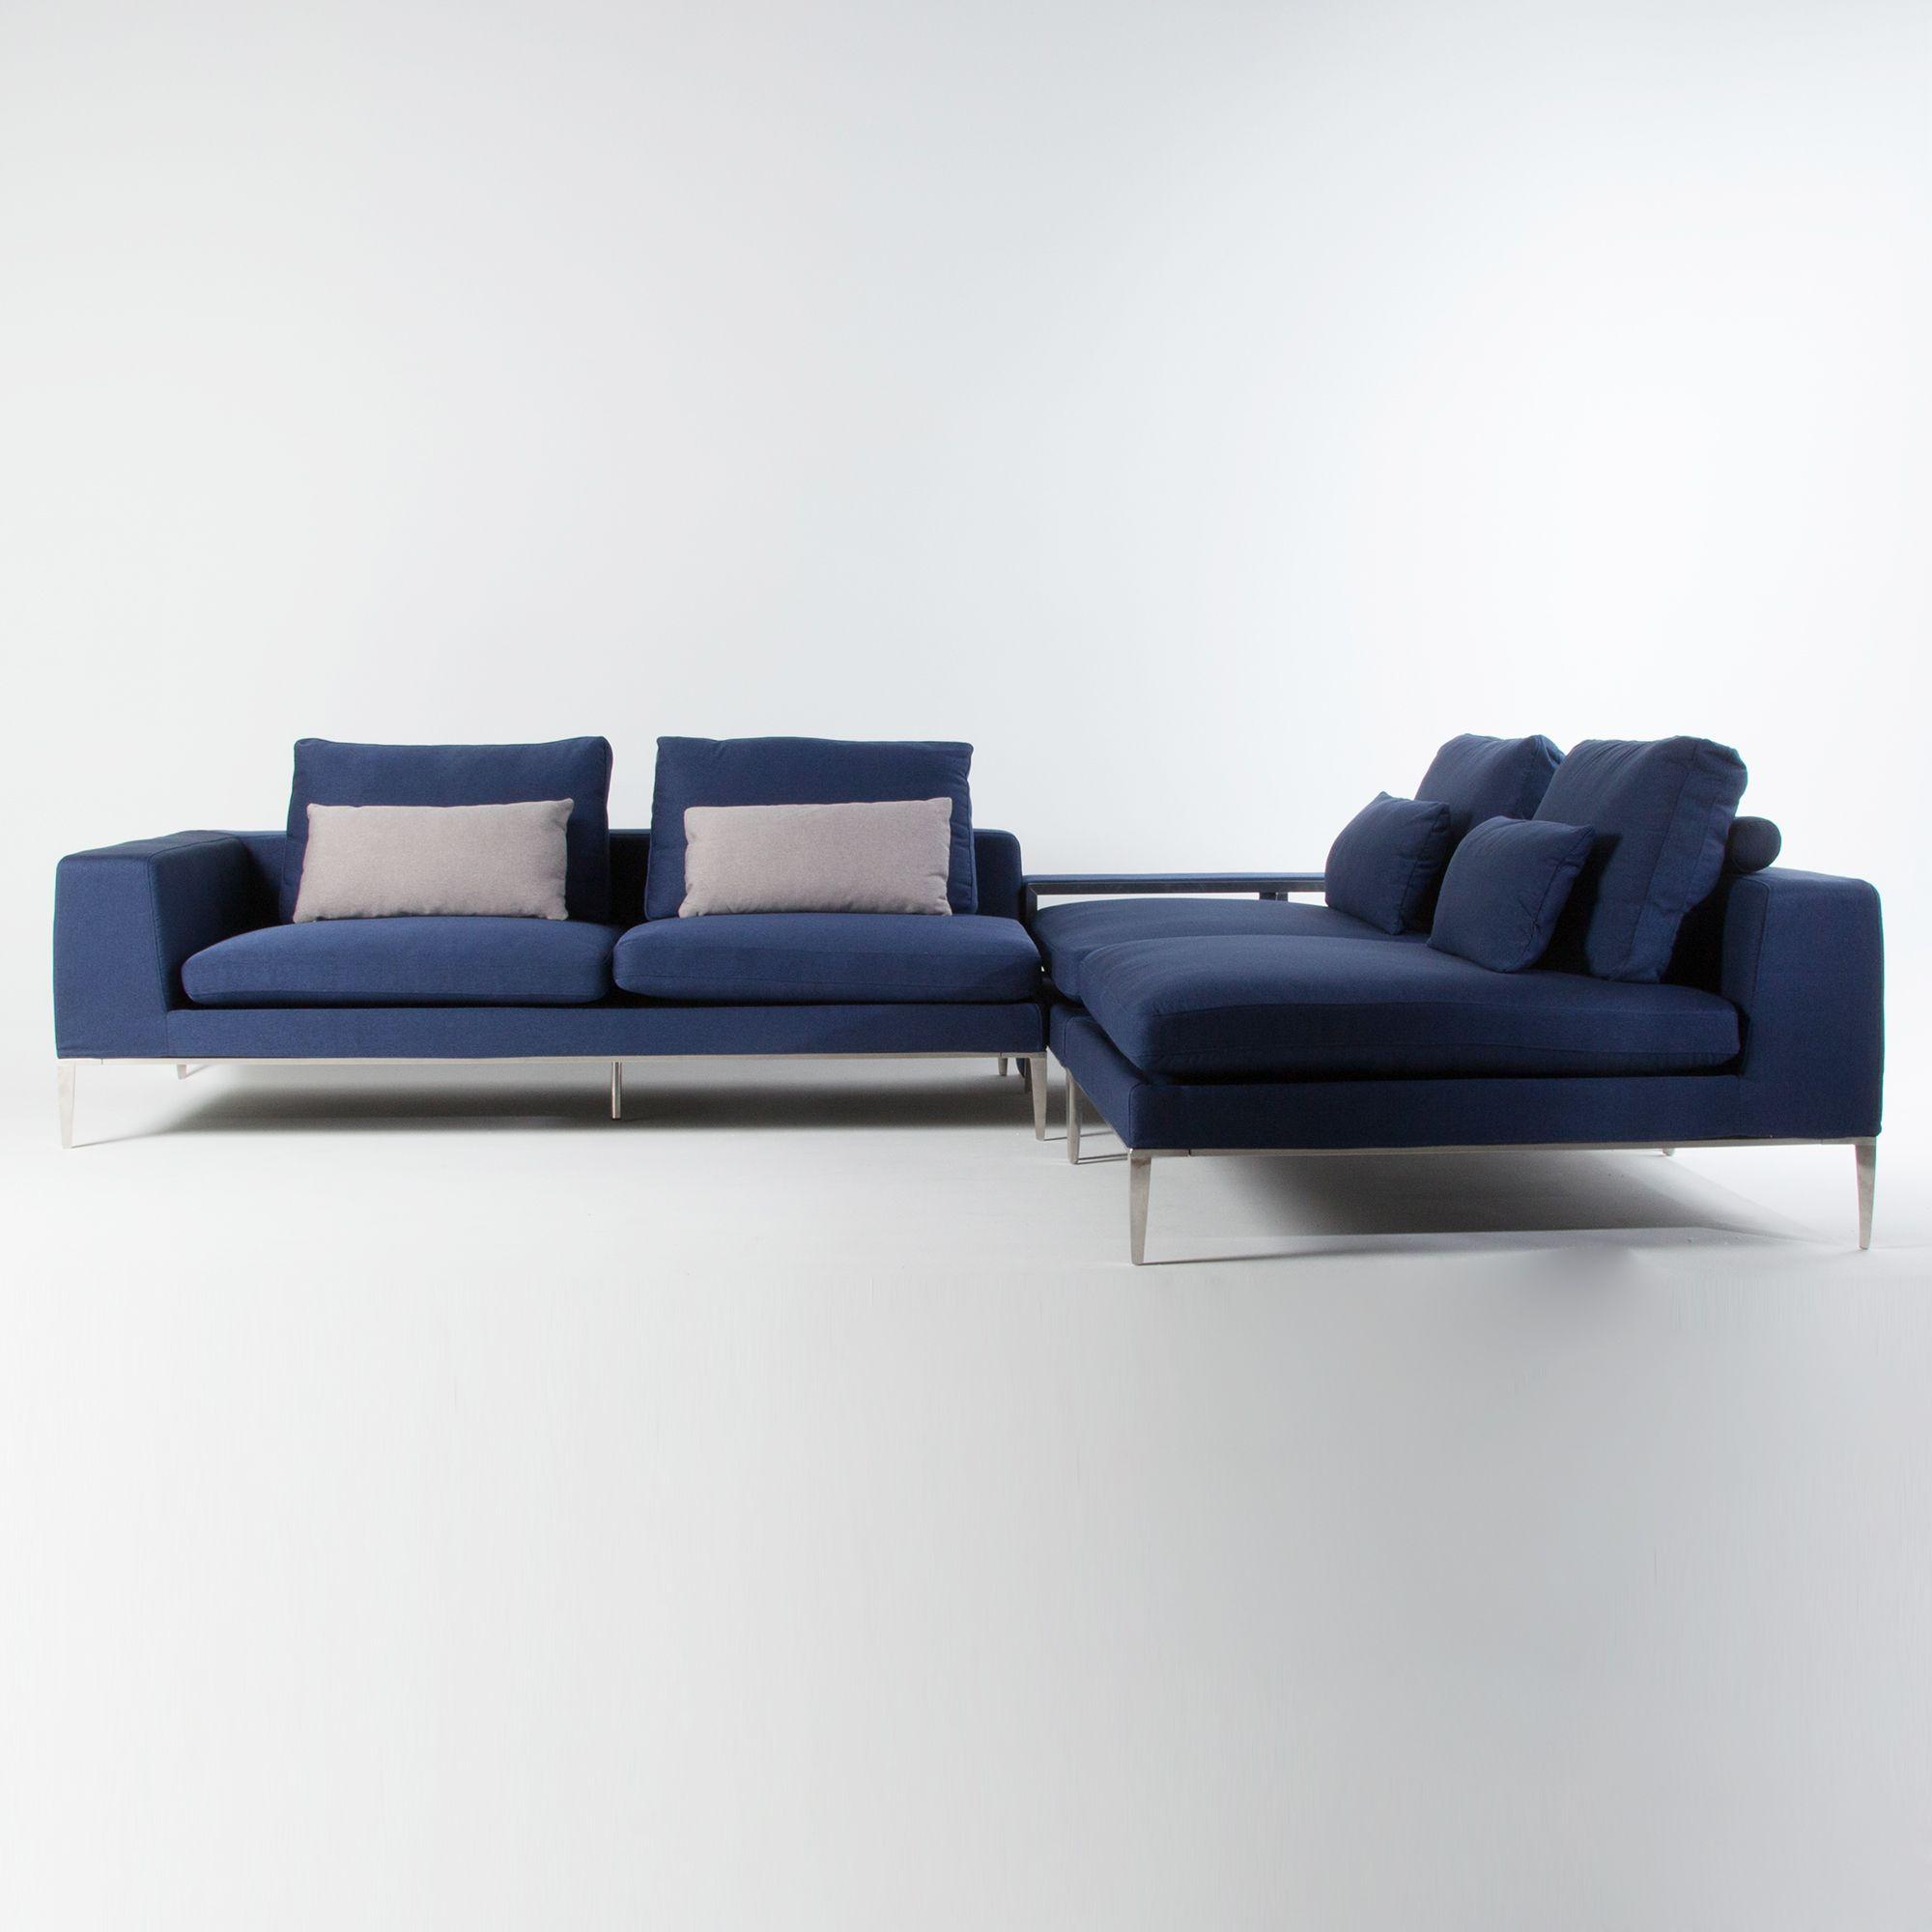 canap d 39 angle modulable tissu bleu 4 places avec pieds m tal coussins yohanna urban living. Black Bedroom Furniture Sets. Home Design Ideas